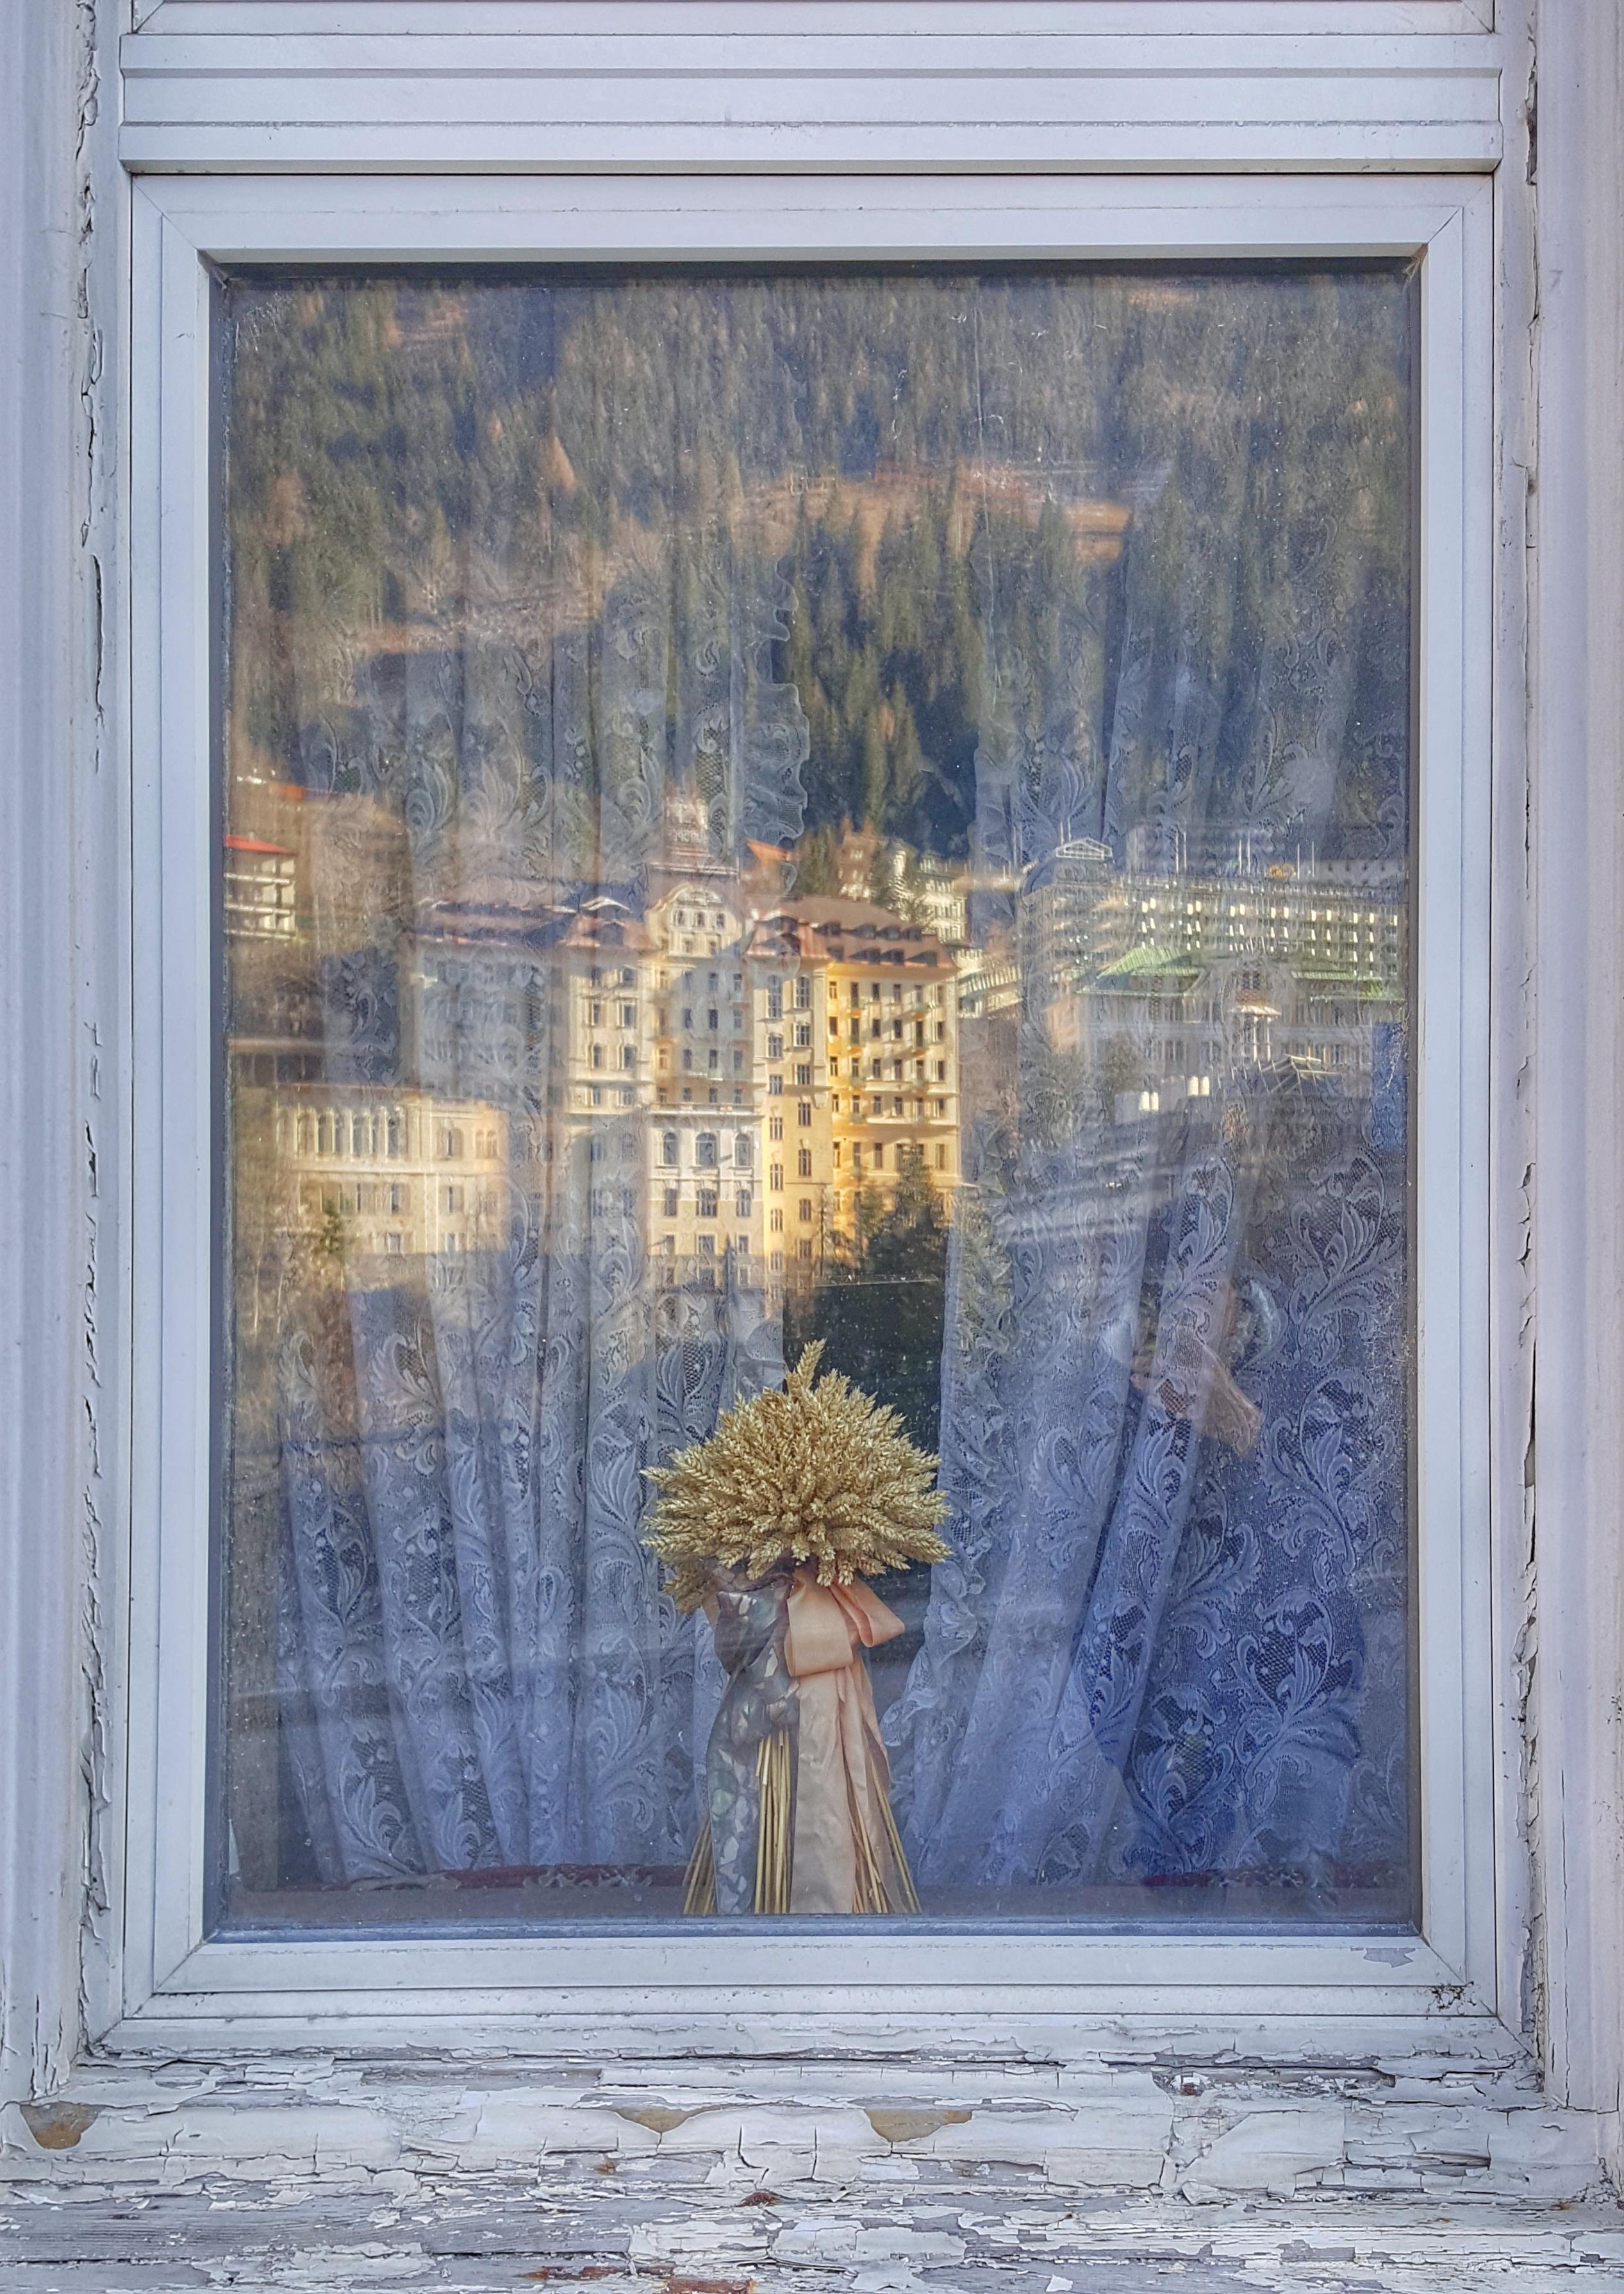 Reflection in a window in Bad Gastein